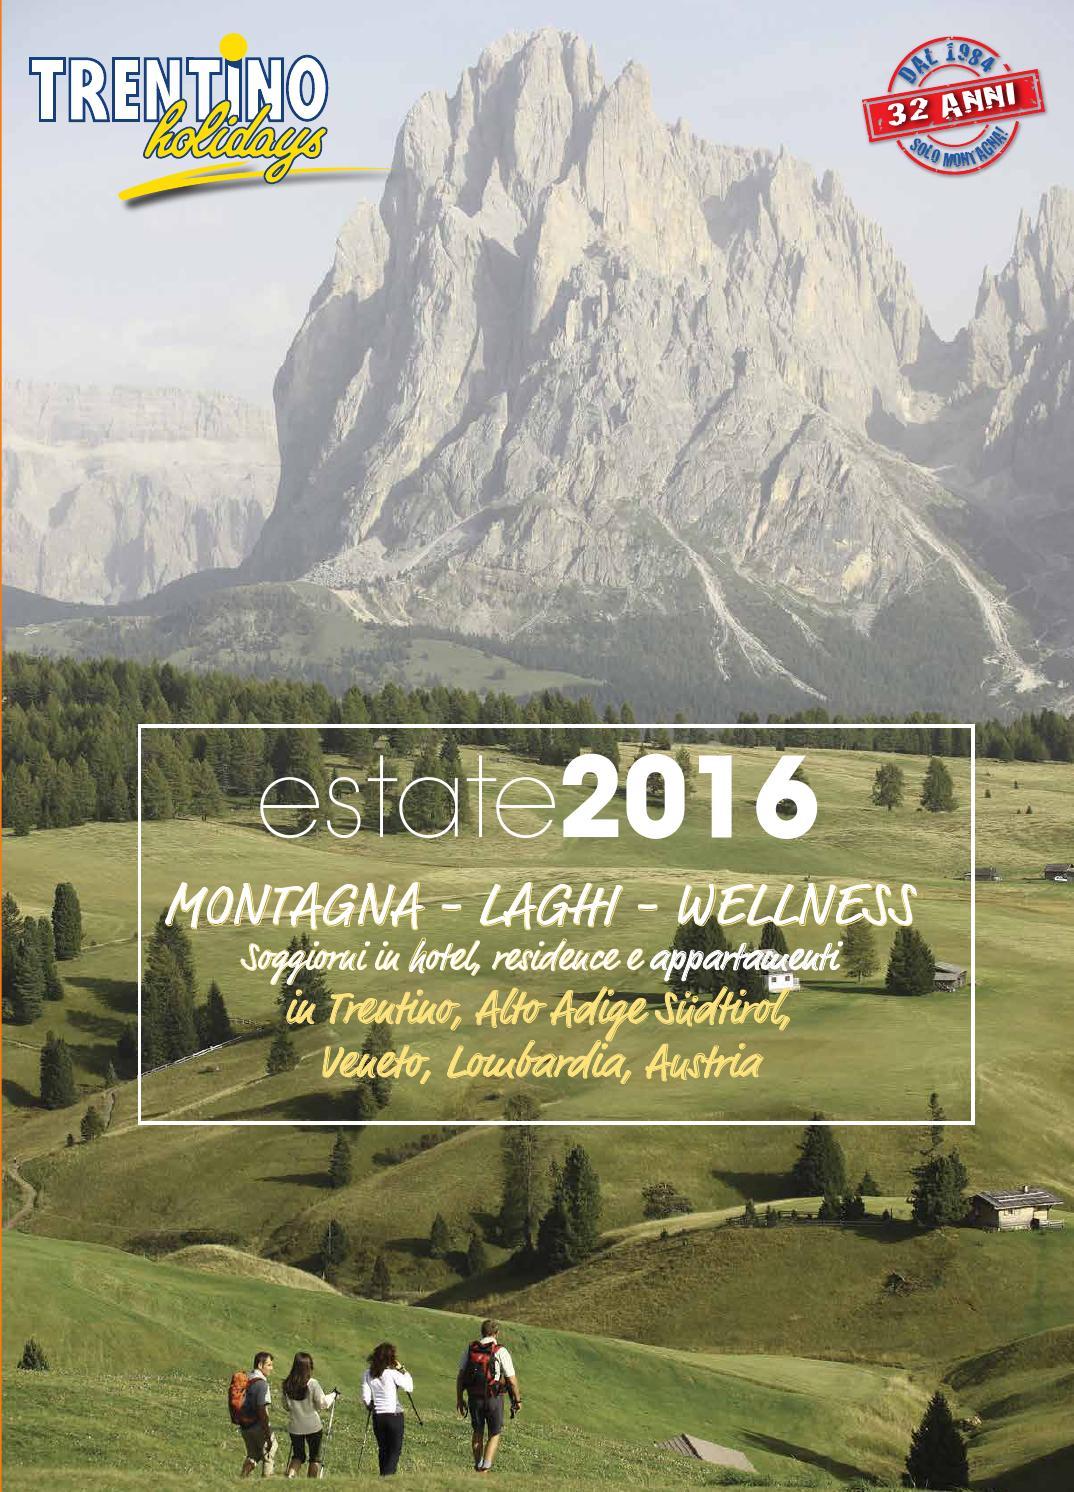 Trentino holidays estate 2016 by enrico luchi - issuu